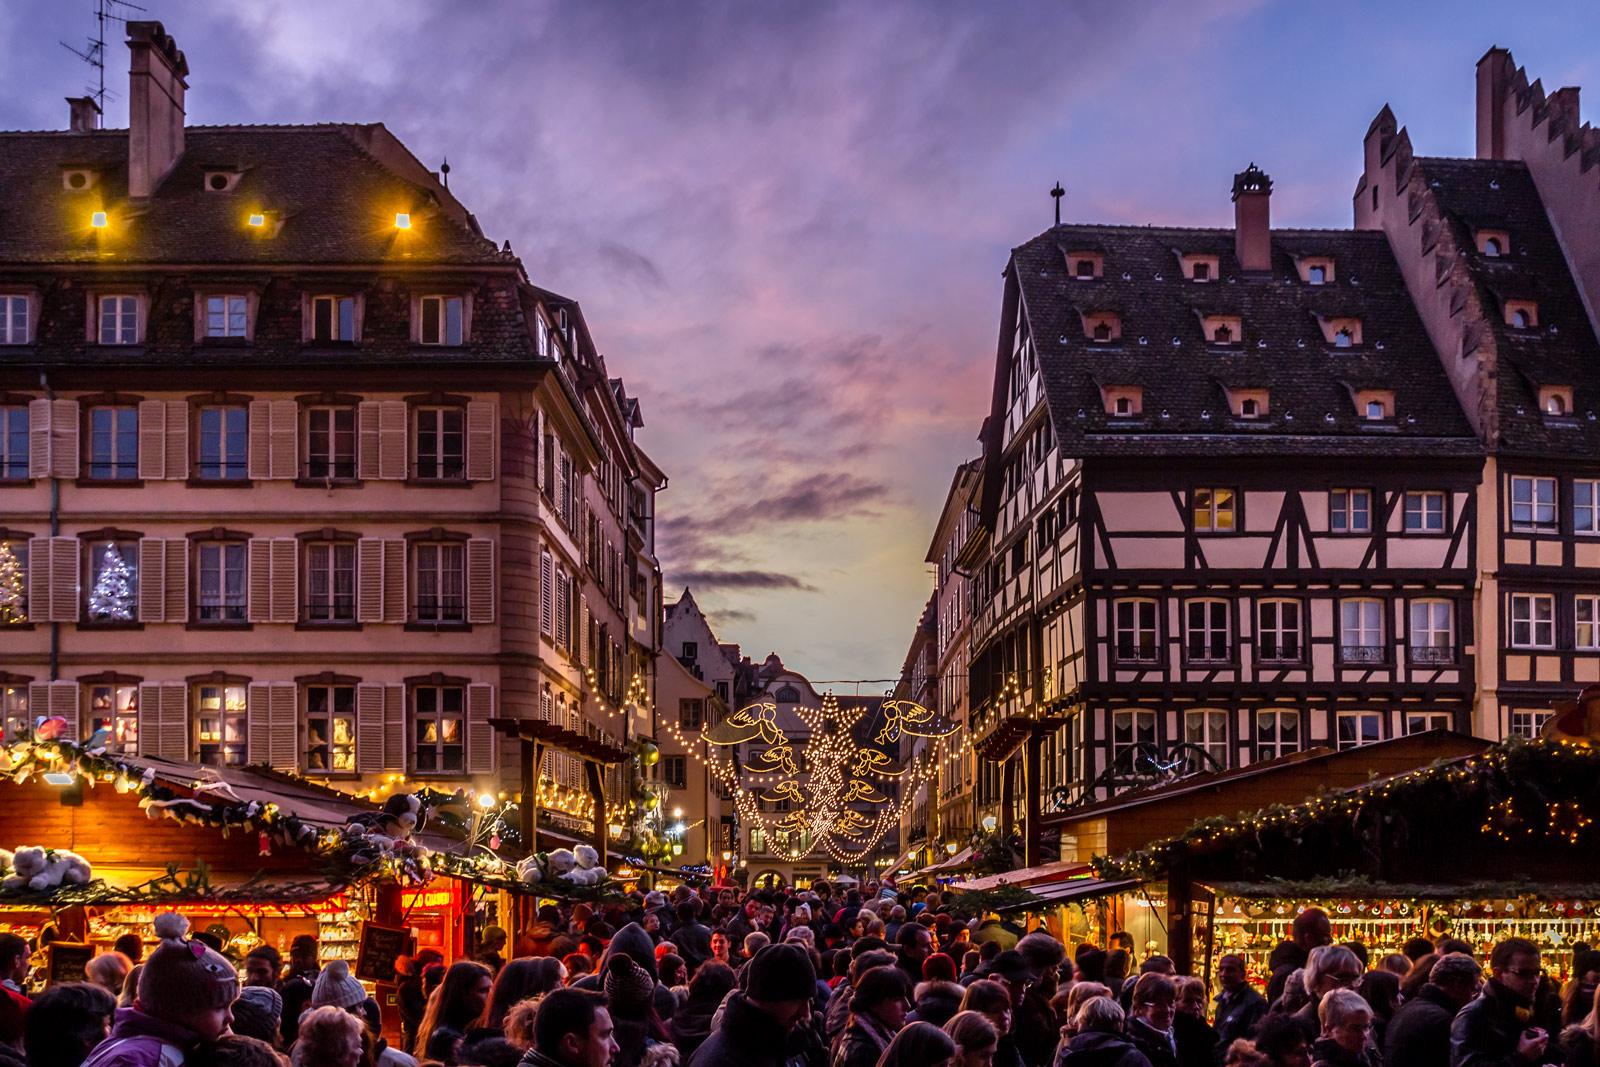 perierga.gr - 7 ωραιότερες χριστουγεννιάτικες ευρωπαϊκές πόλεις!